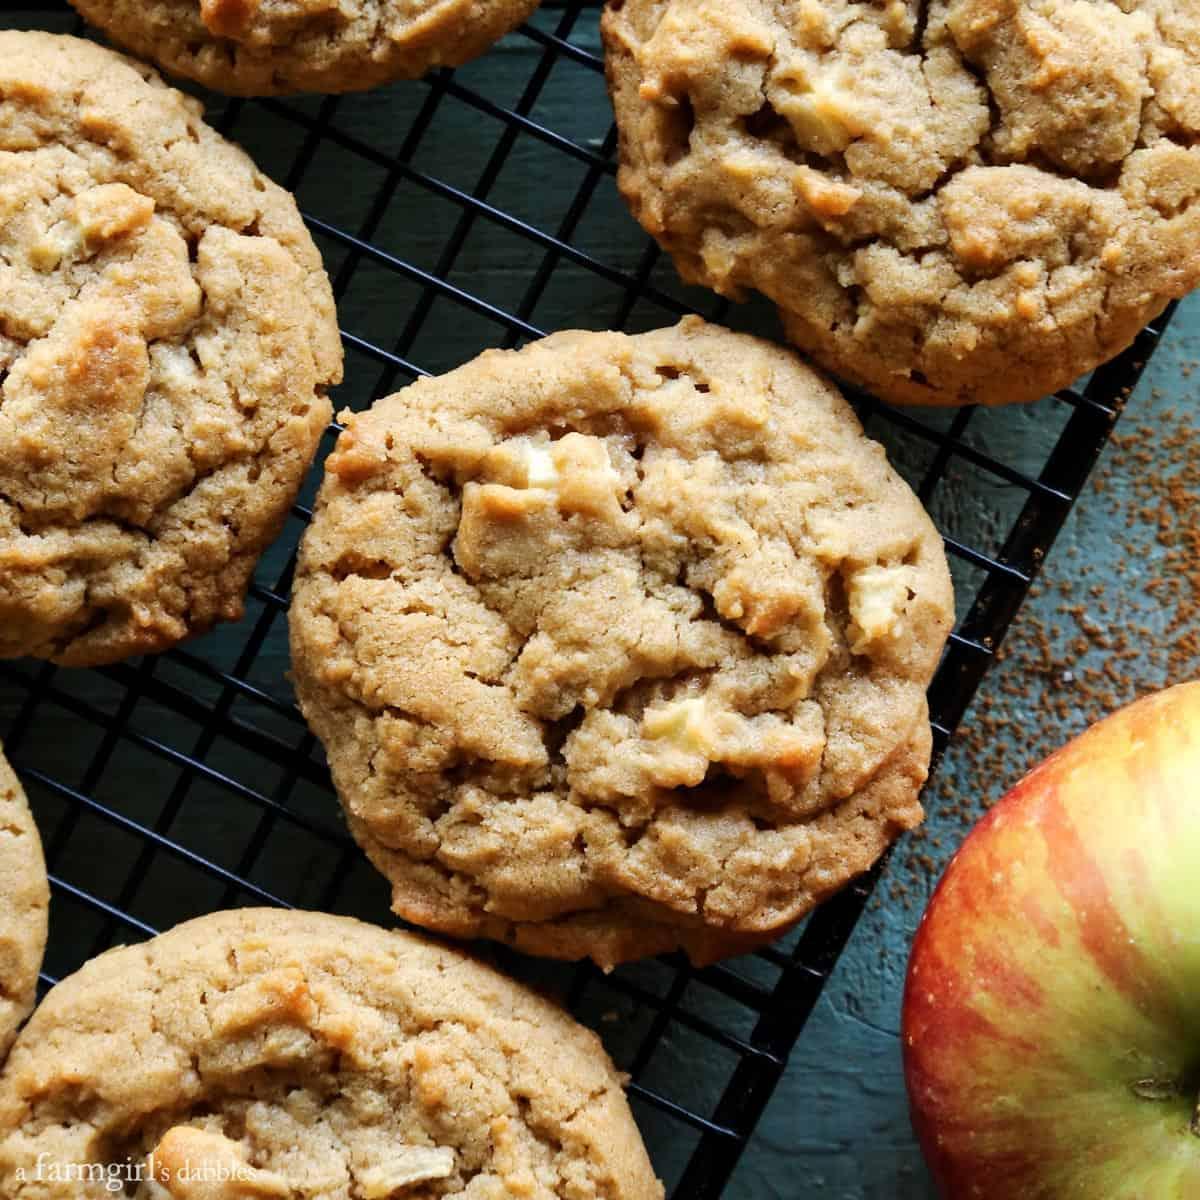 Apple Peanut Butter Cookies from afarmgirlsdabbles.com